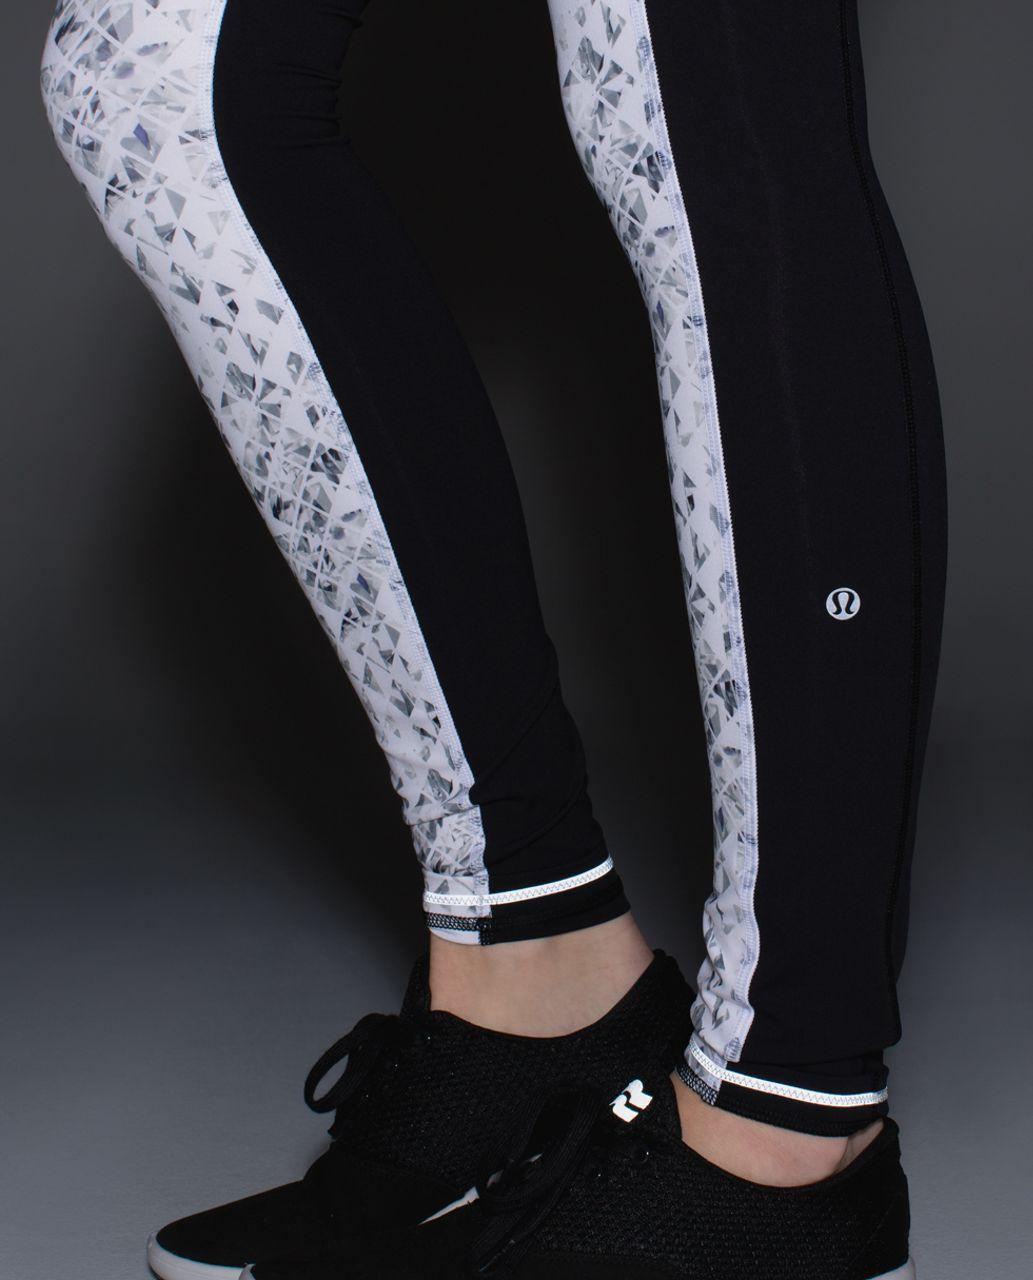 Lululemon Speed Tight II *Full-On Luxtreme - Unbreakable White Black / Black / White